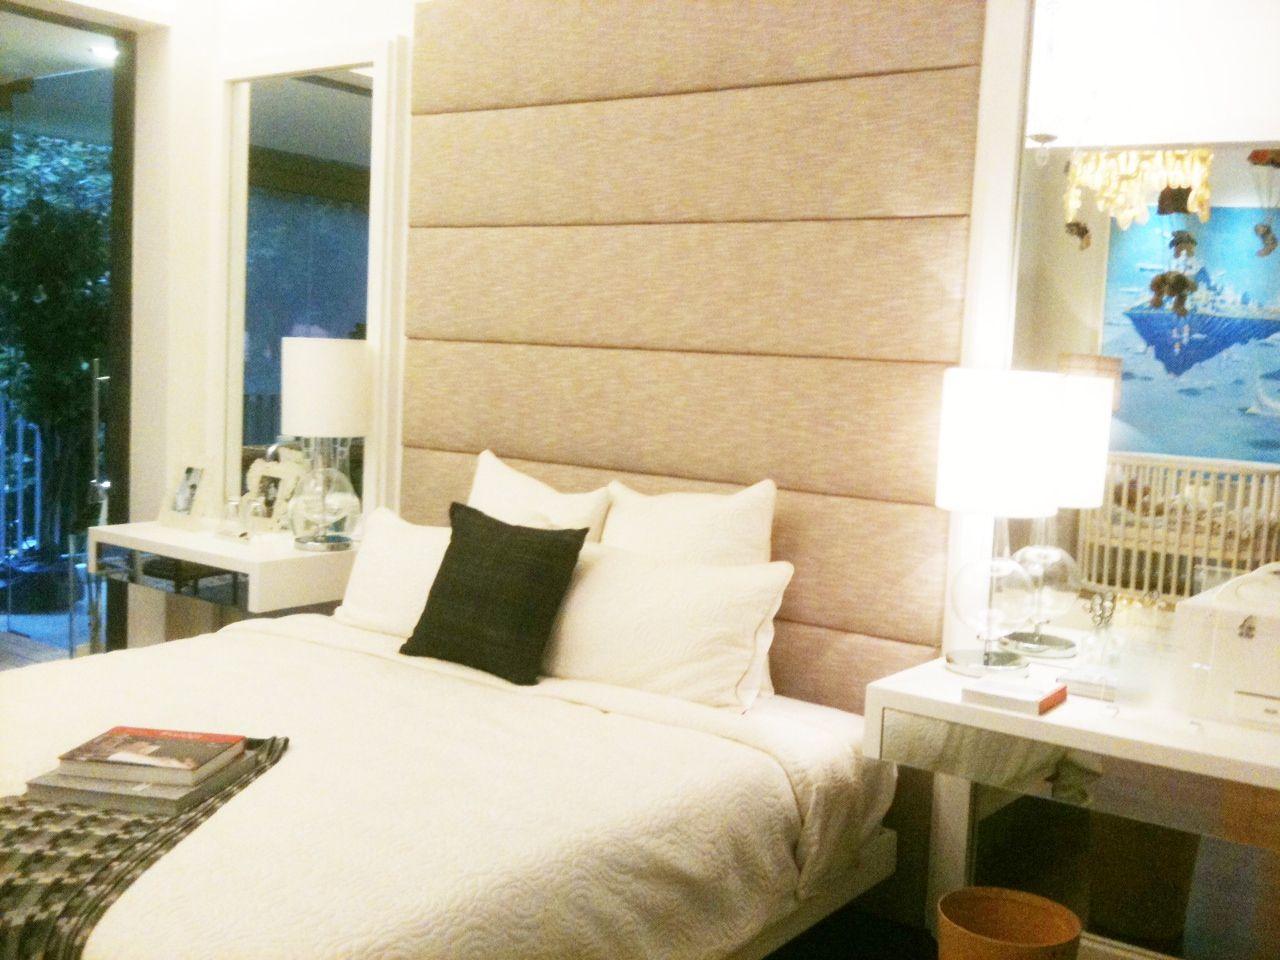 full height headboard | Bedroom ideas | Pinterest | Bedrooms